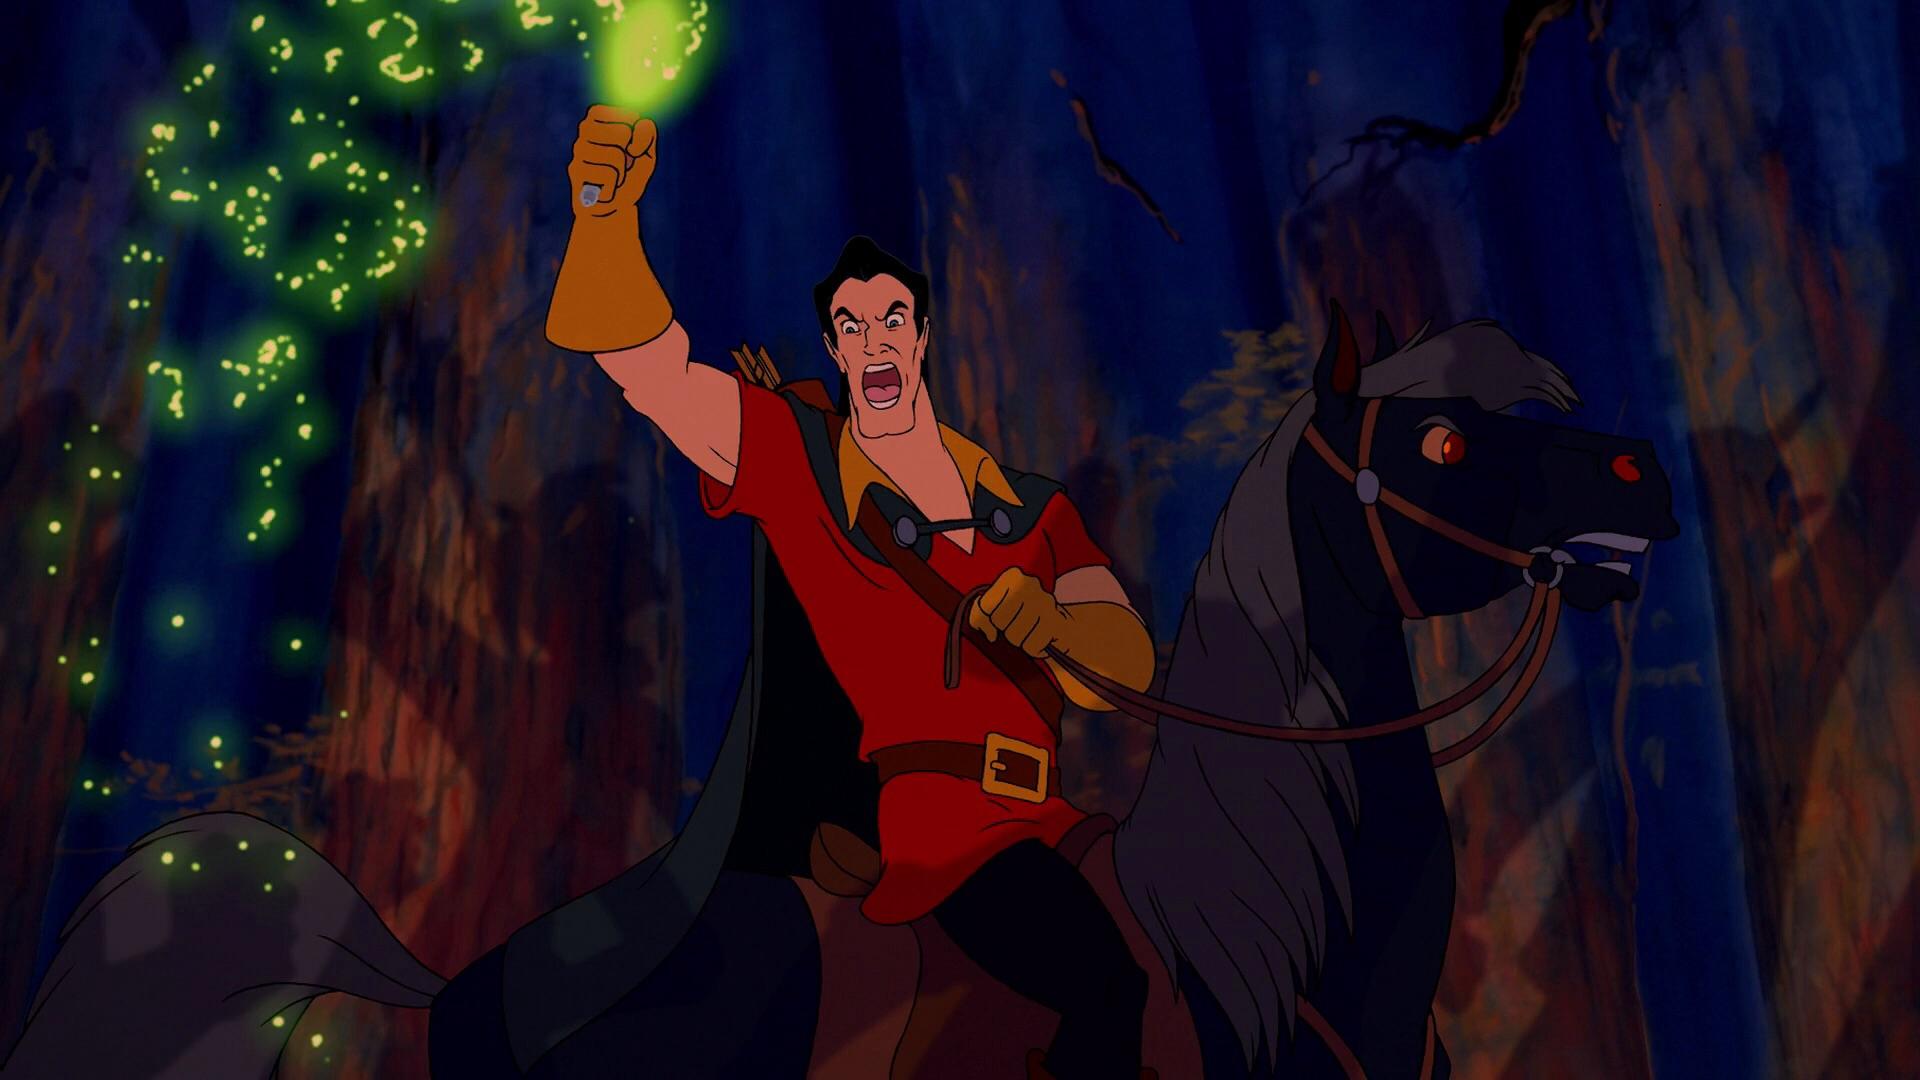 Gaston | Disney Wiki | Fandom